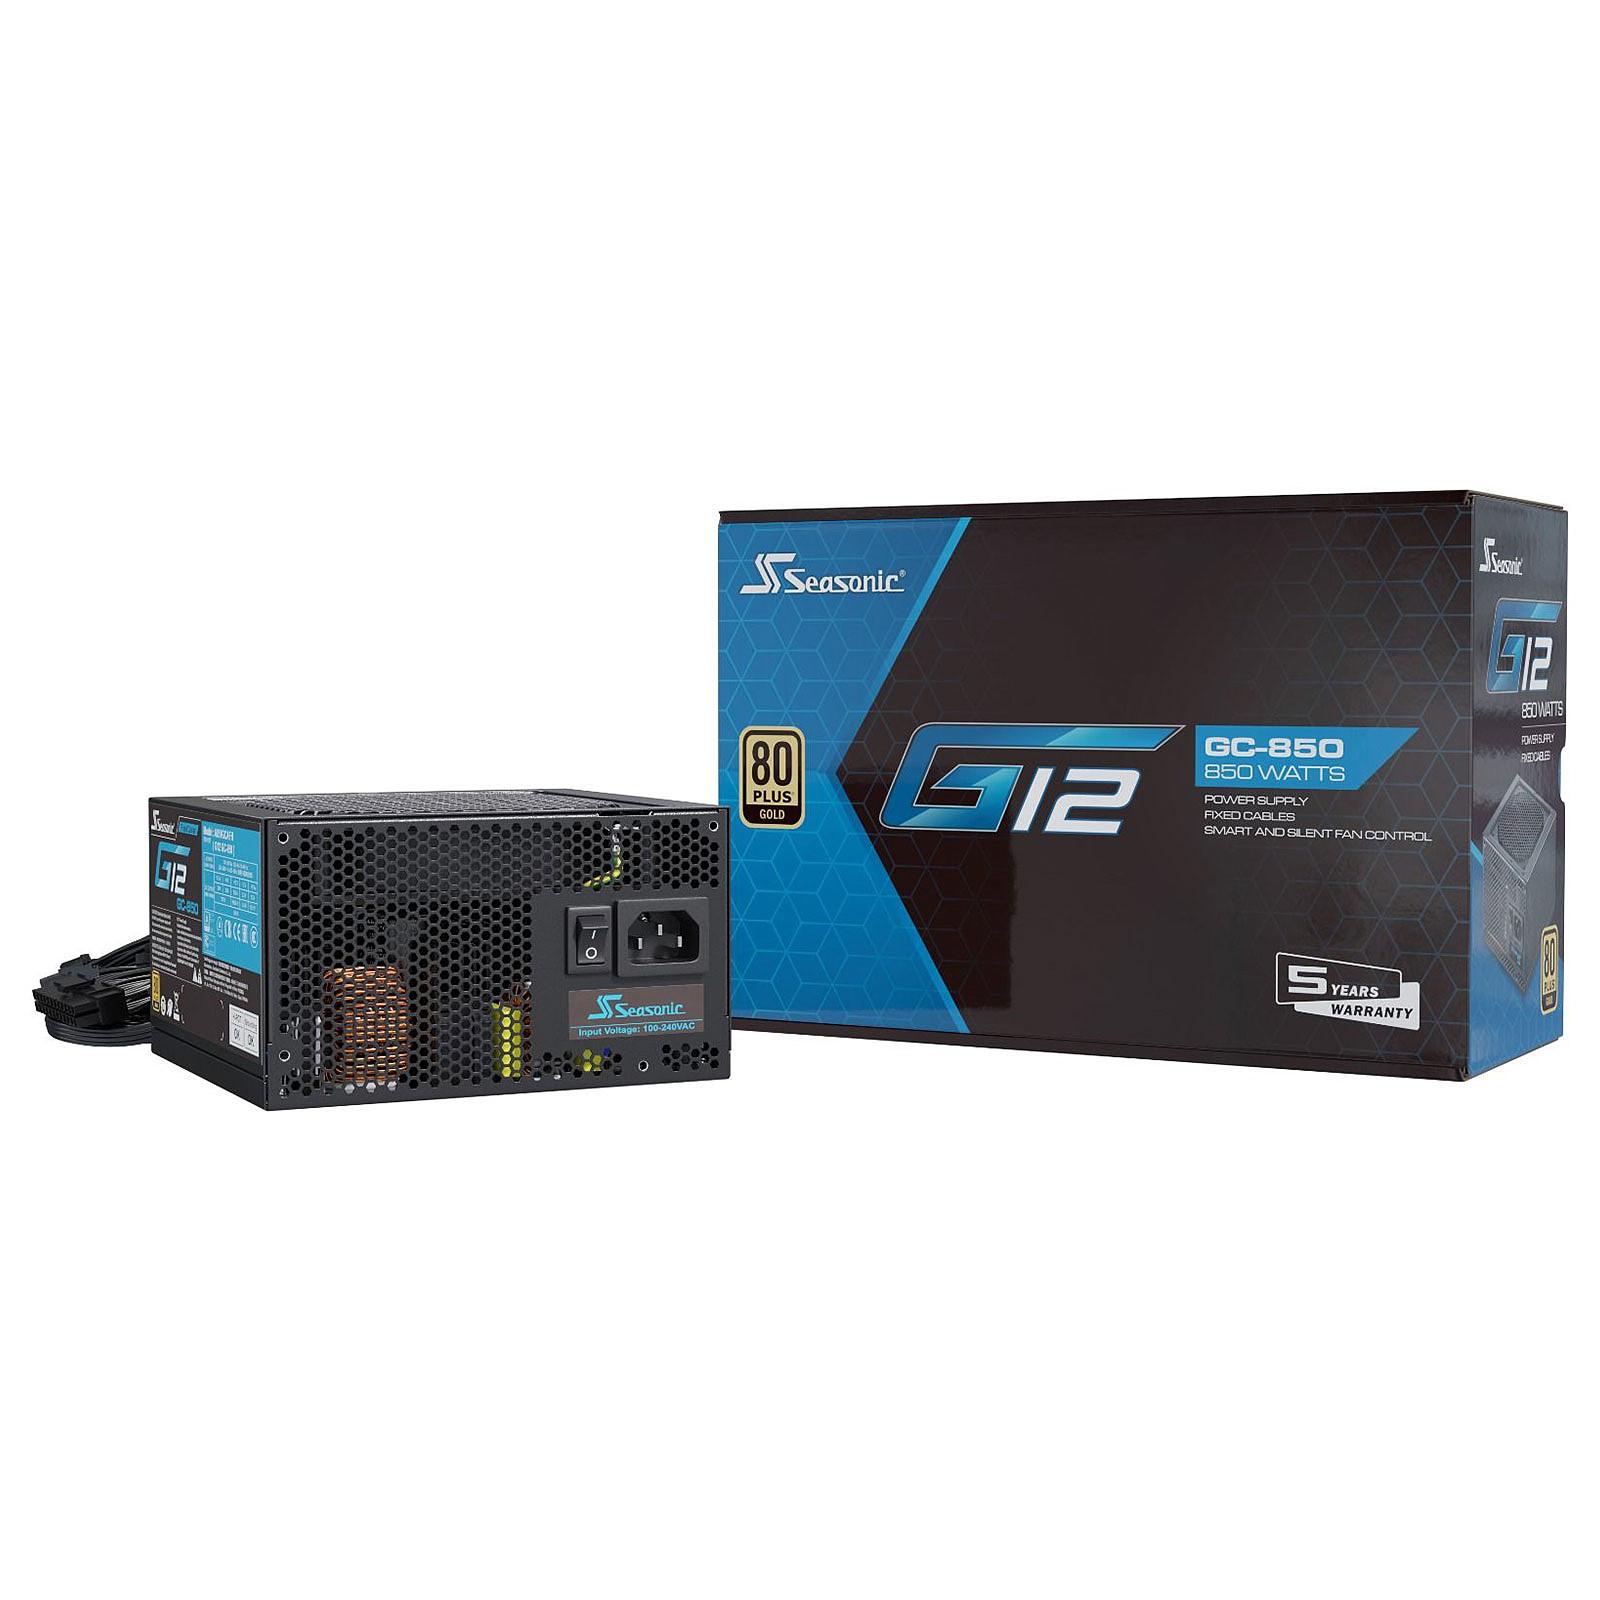 Alimentation PC non-modulaire Seasonic G12 GC - 850W, 80+ Gold, ATX